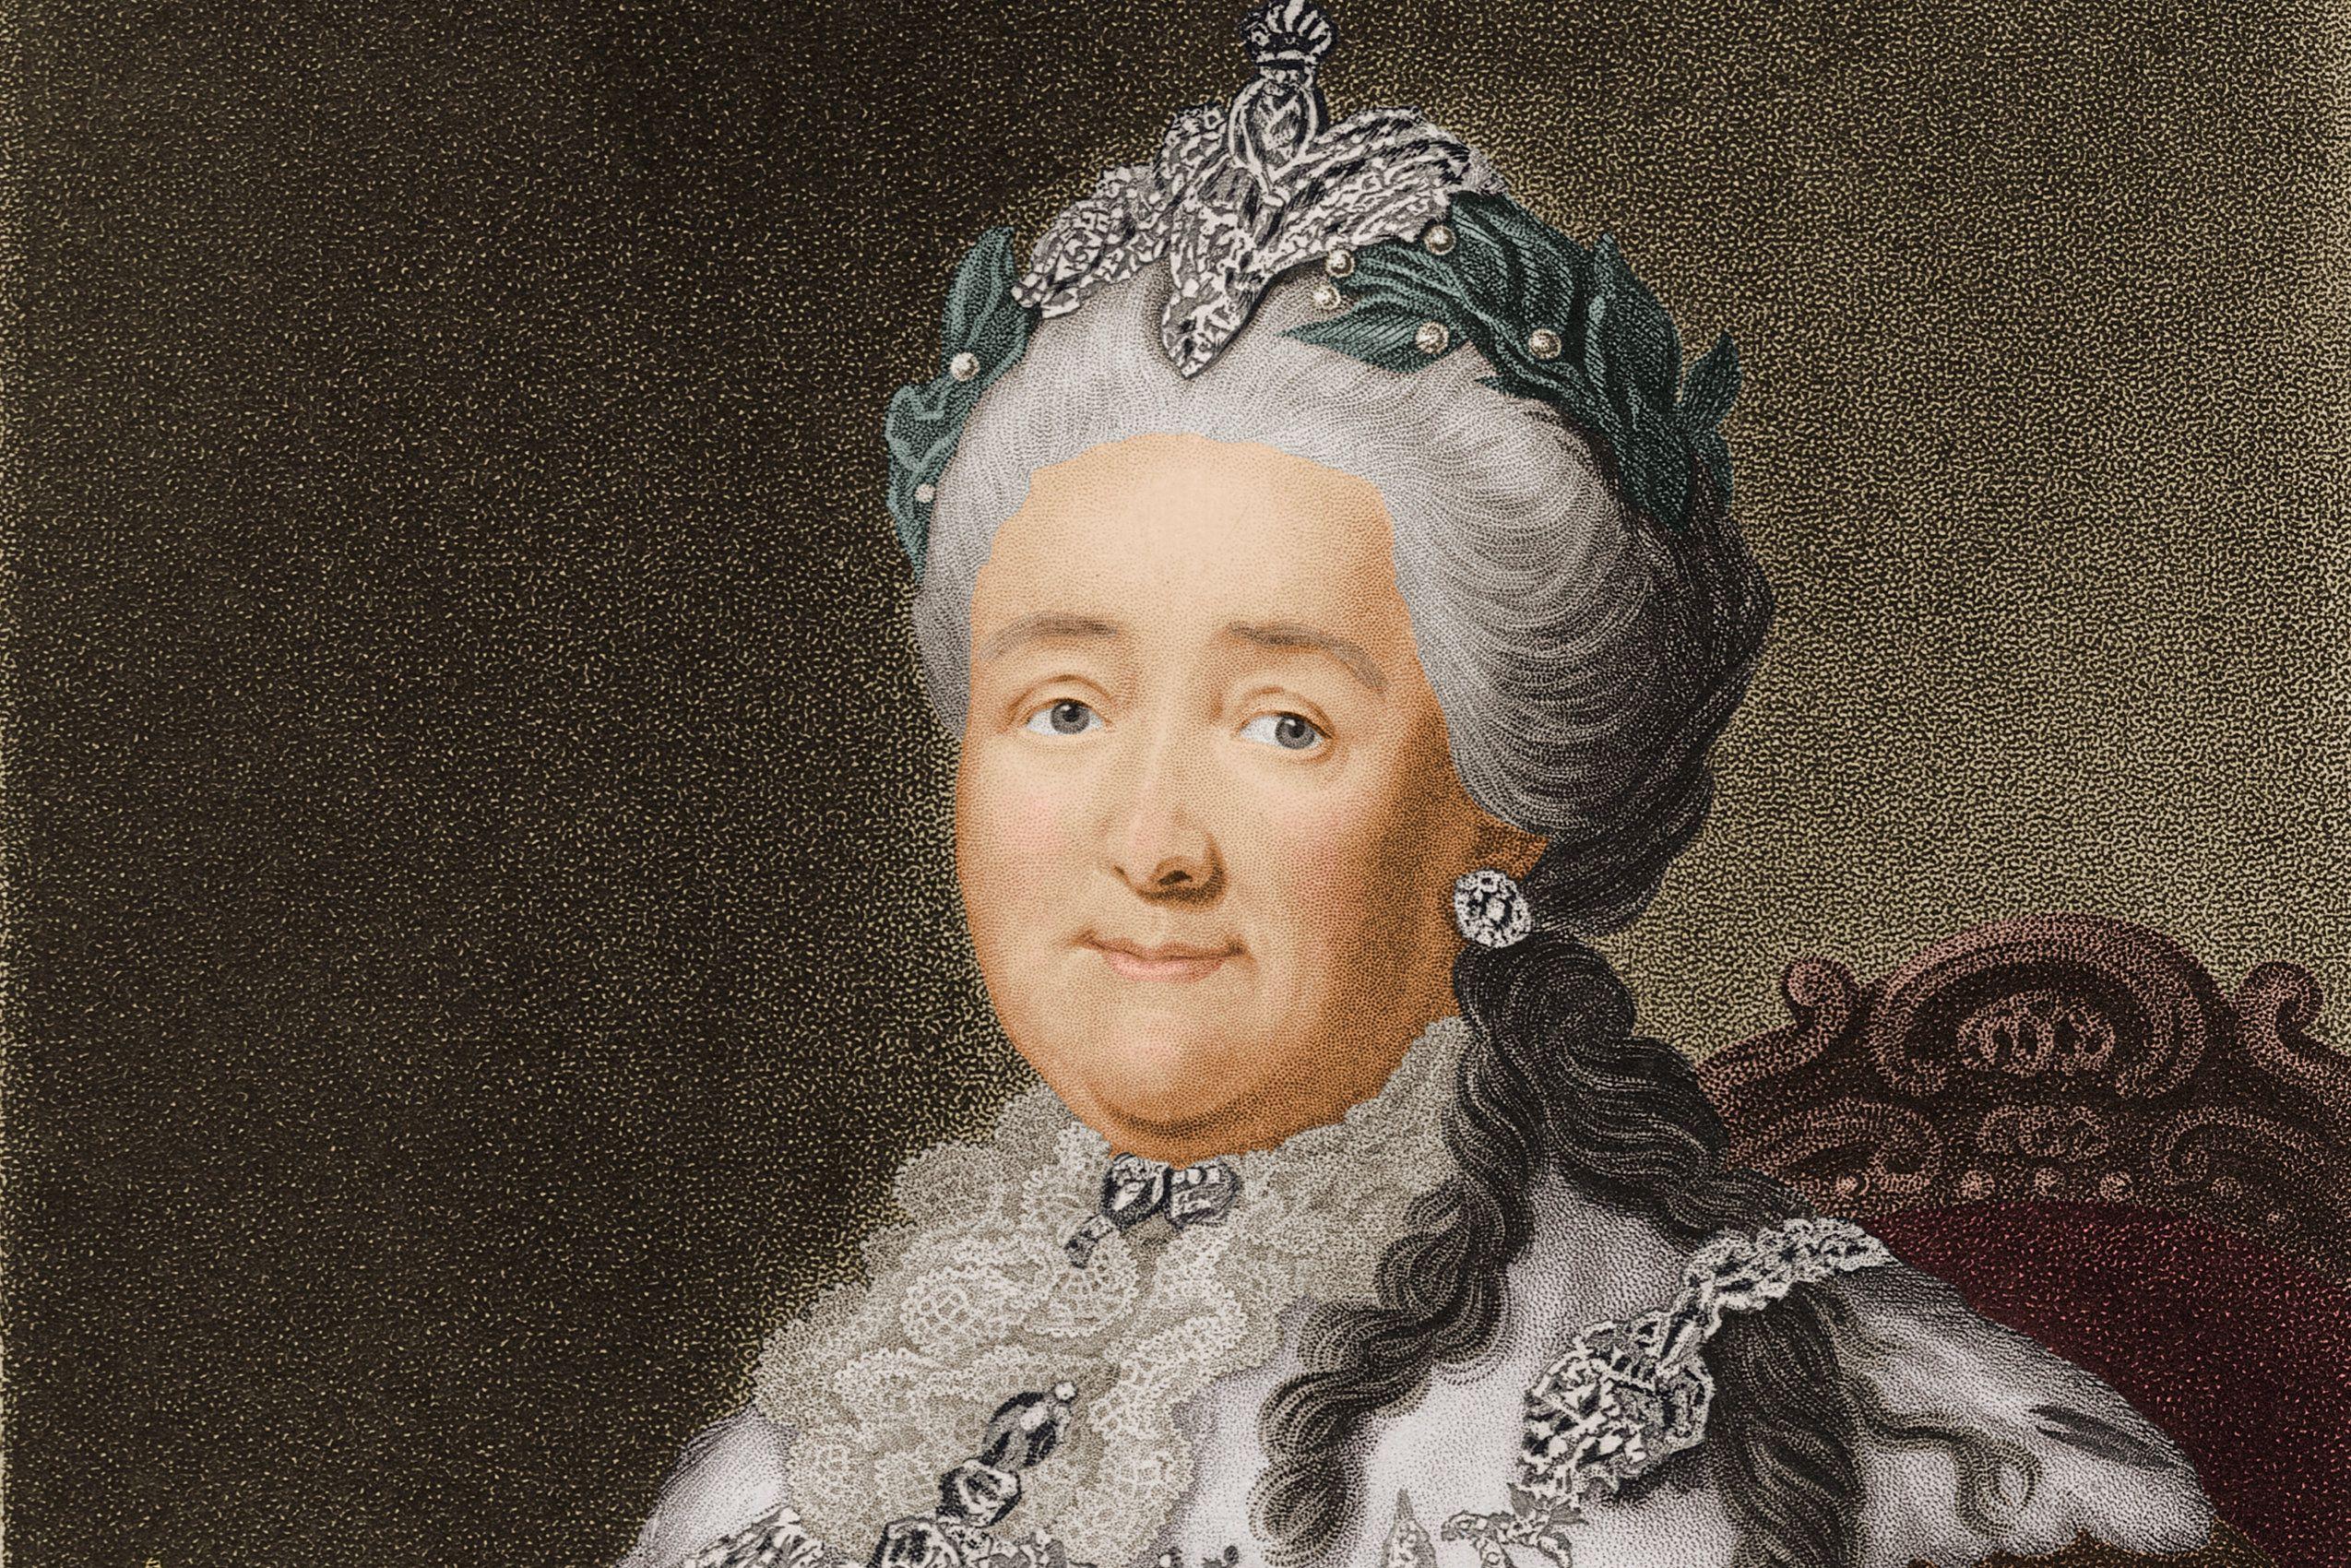 Catherine II of Russia (1729-1796)